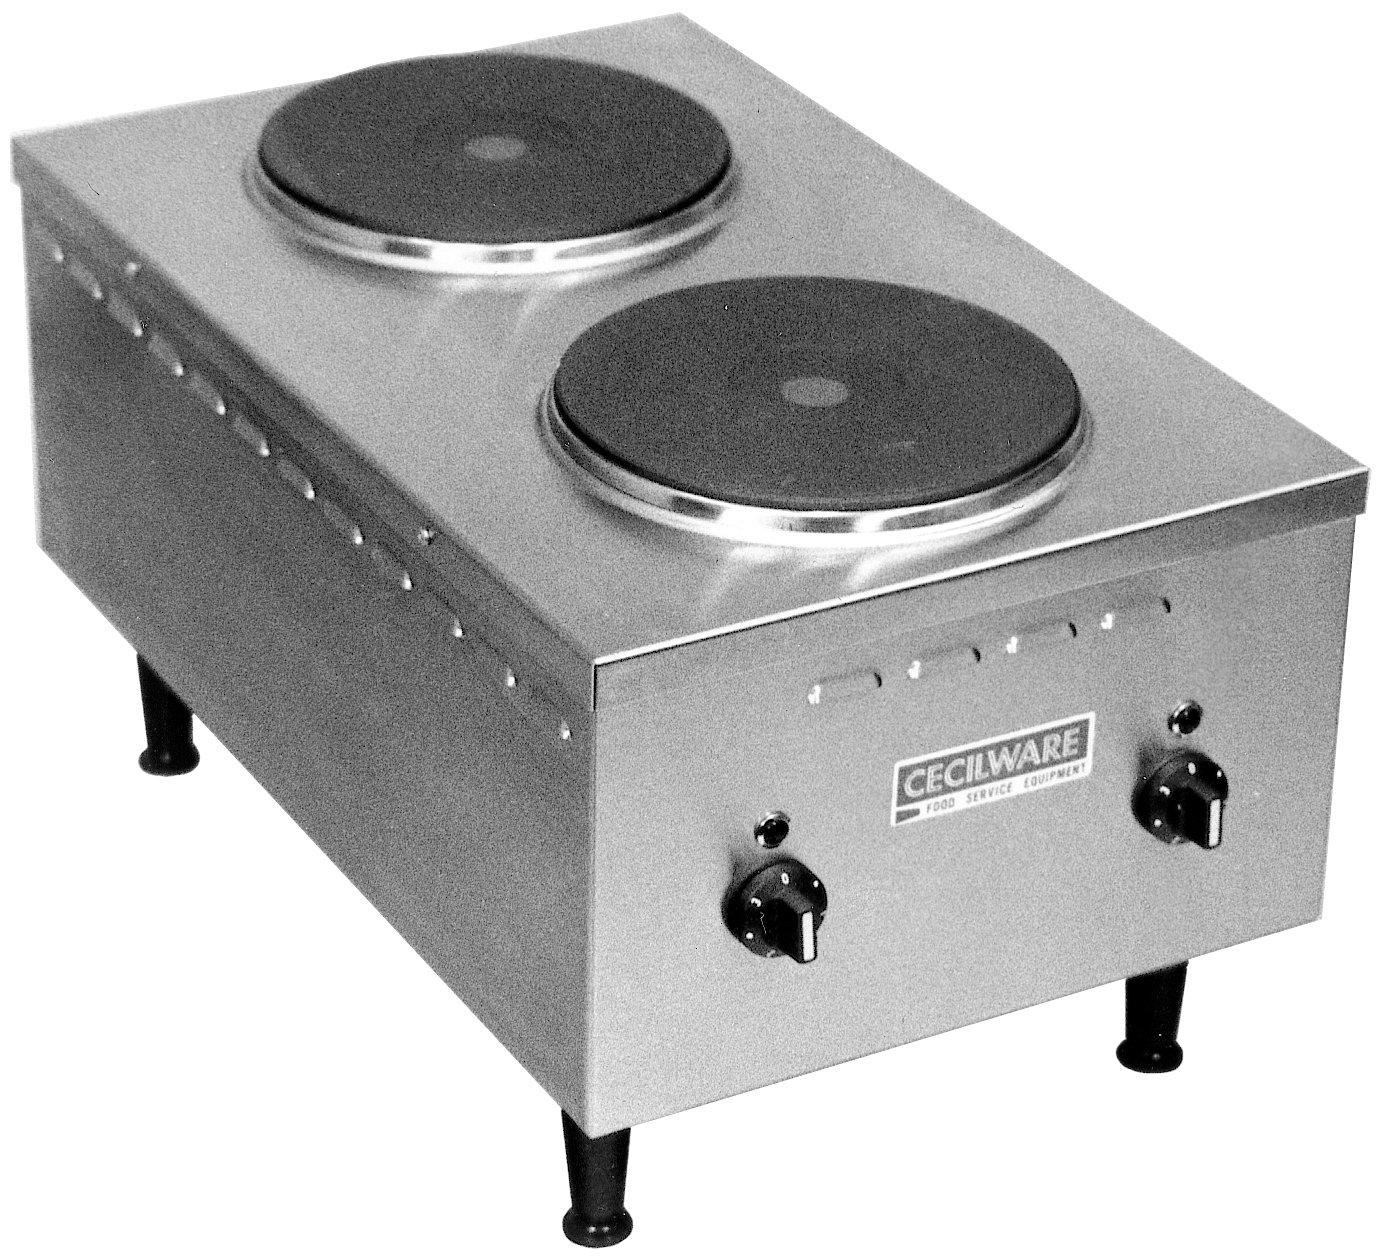 Grindmaster-Cecilware EL24SH Electric Stainless Steel Short Order Stove, Nema Plug 6-30R